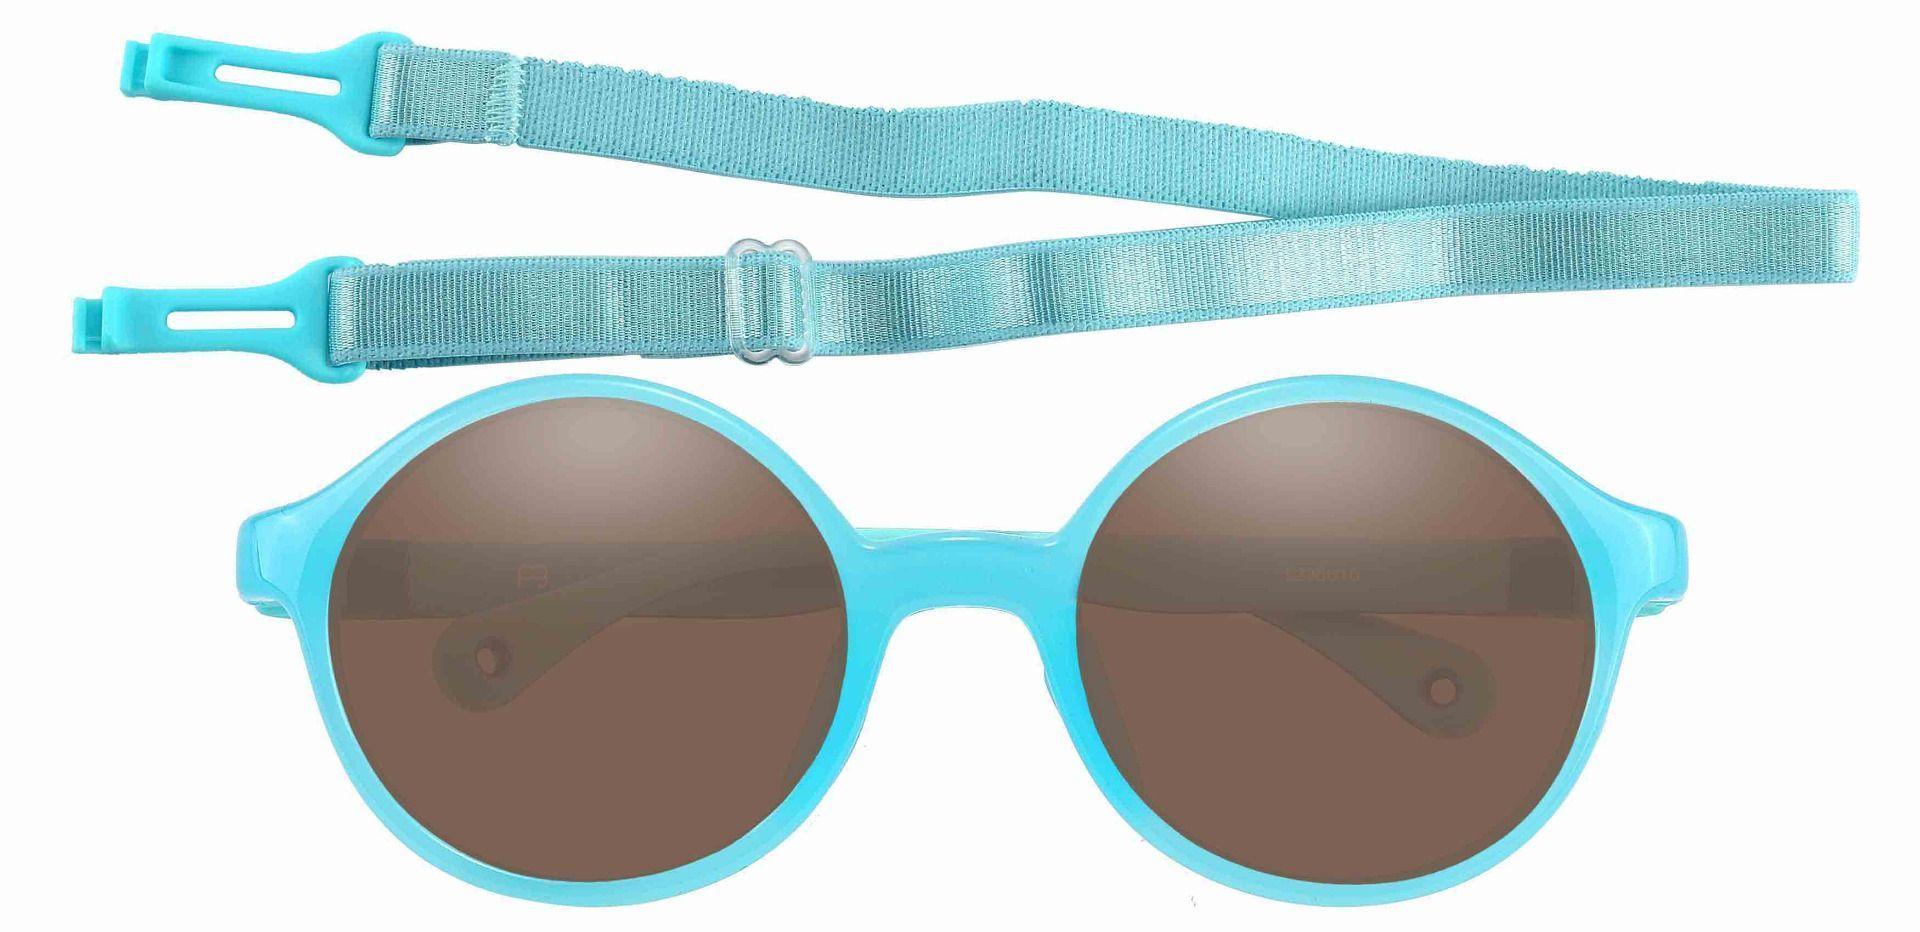 Sammy Round Prescription Sunglasses - Blue Frame With Brown Lenses